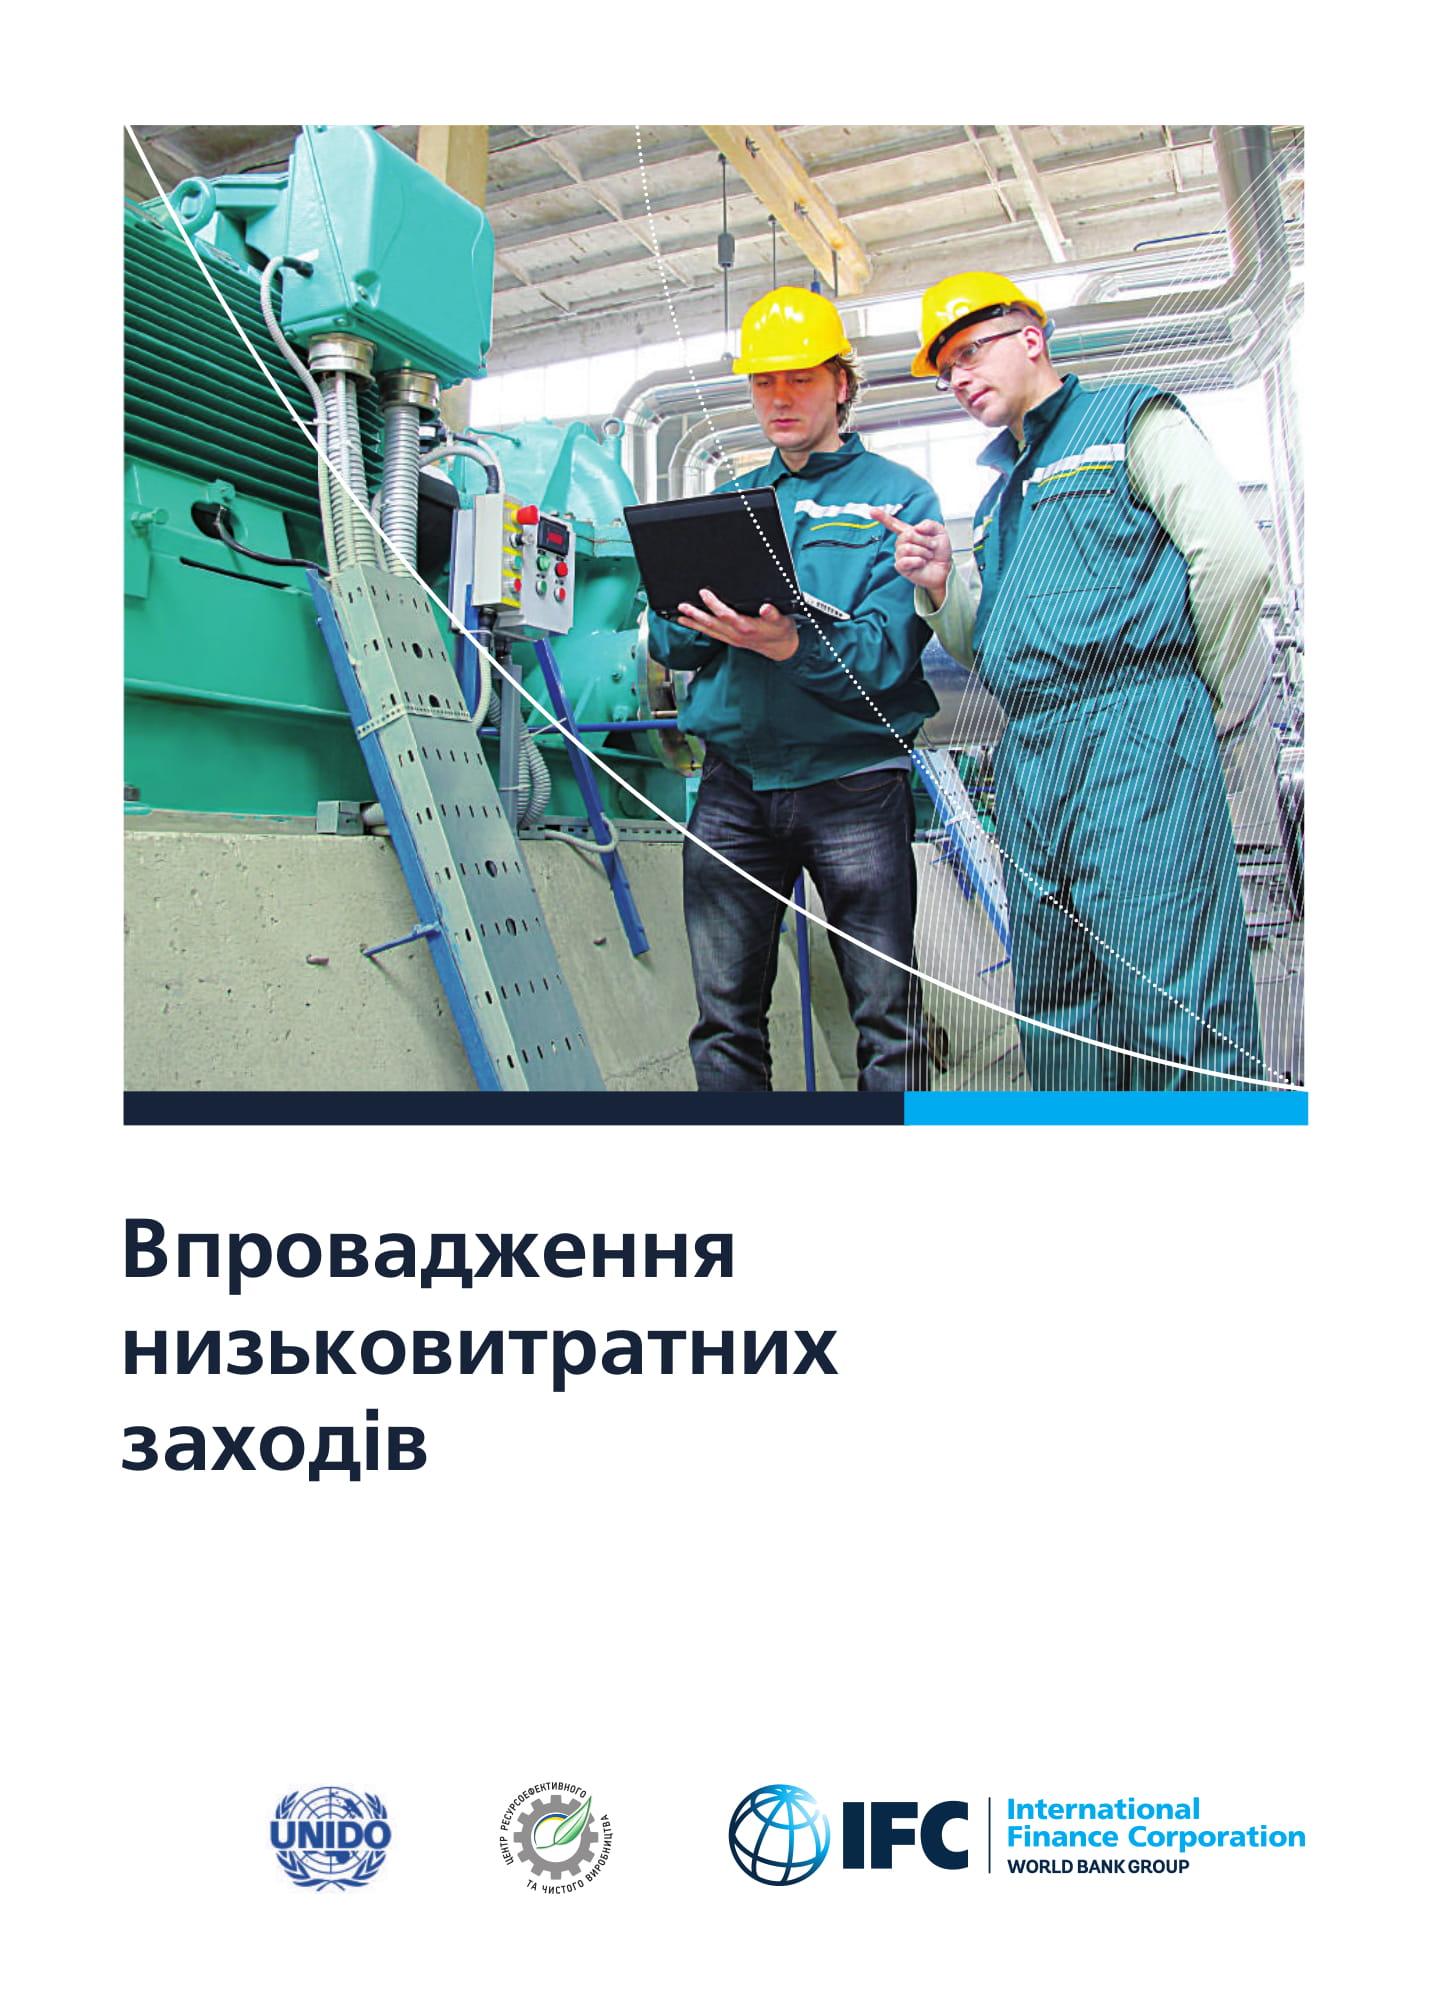 IFC_UNIDO_Low-cost-measures-01-e1518440359379